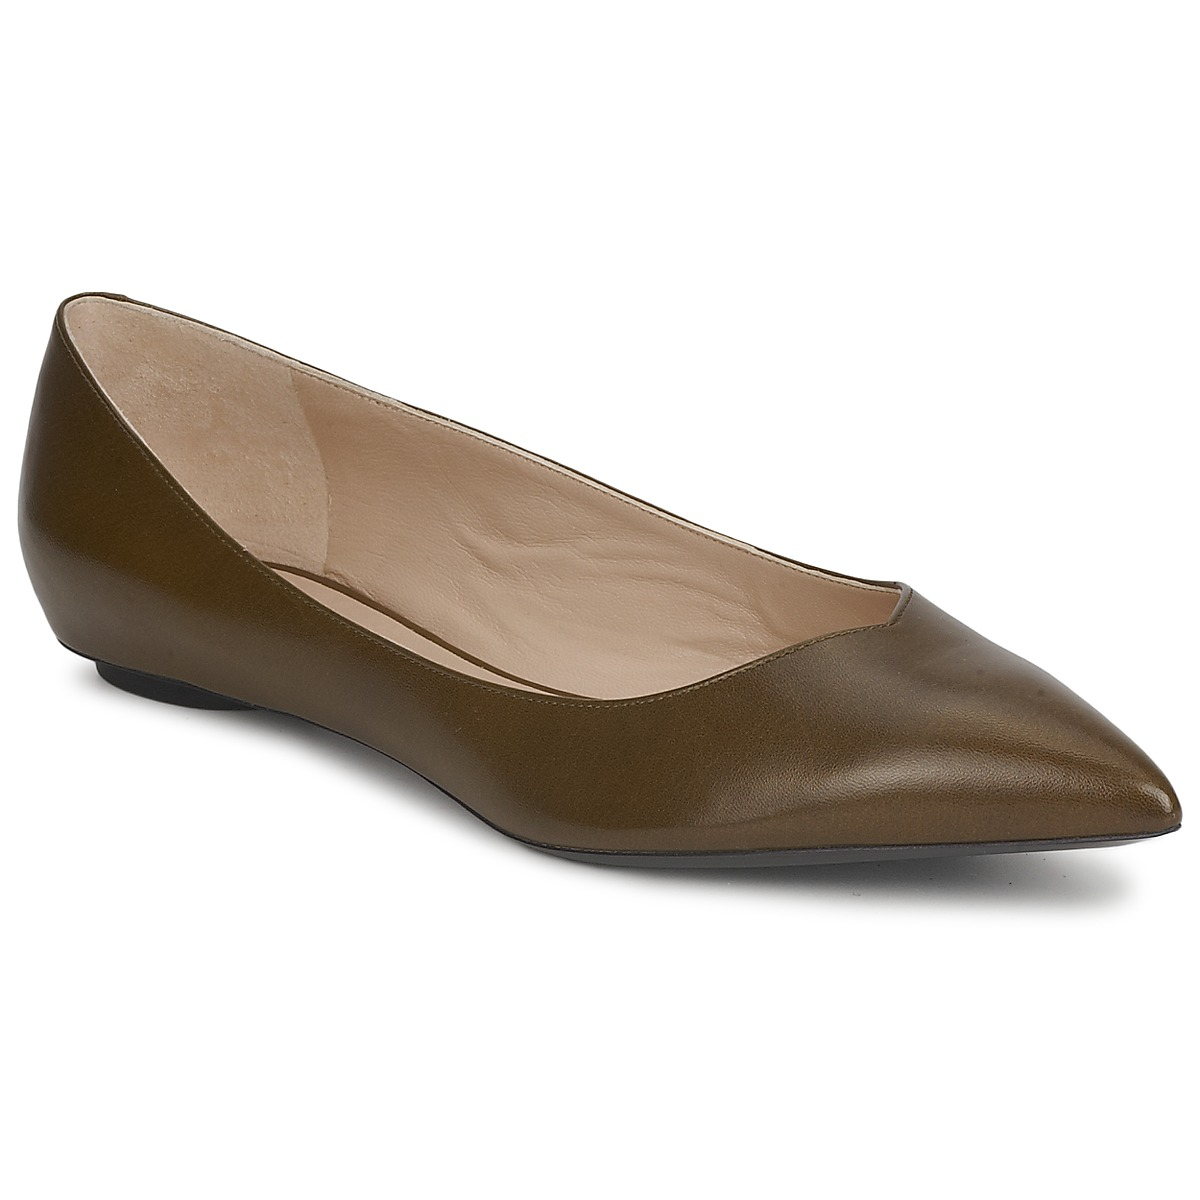 Marc Jacobs MALAGA Maulwurf - Kostenloser Versand bei Spartoode ! - Schuhe Ballerinas Damen 179,50 €